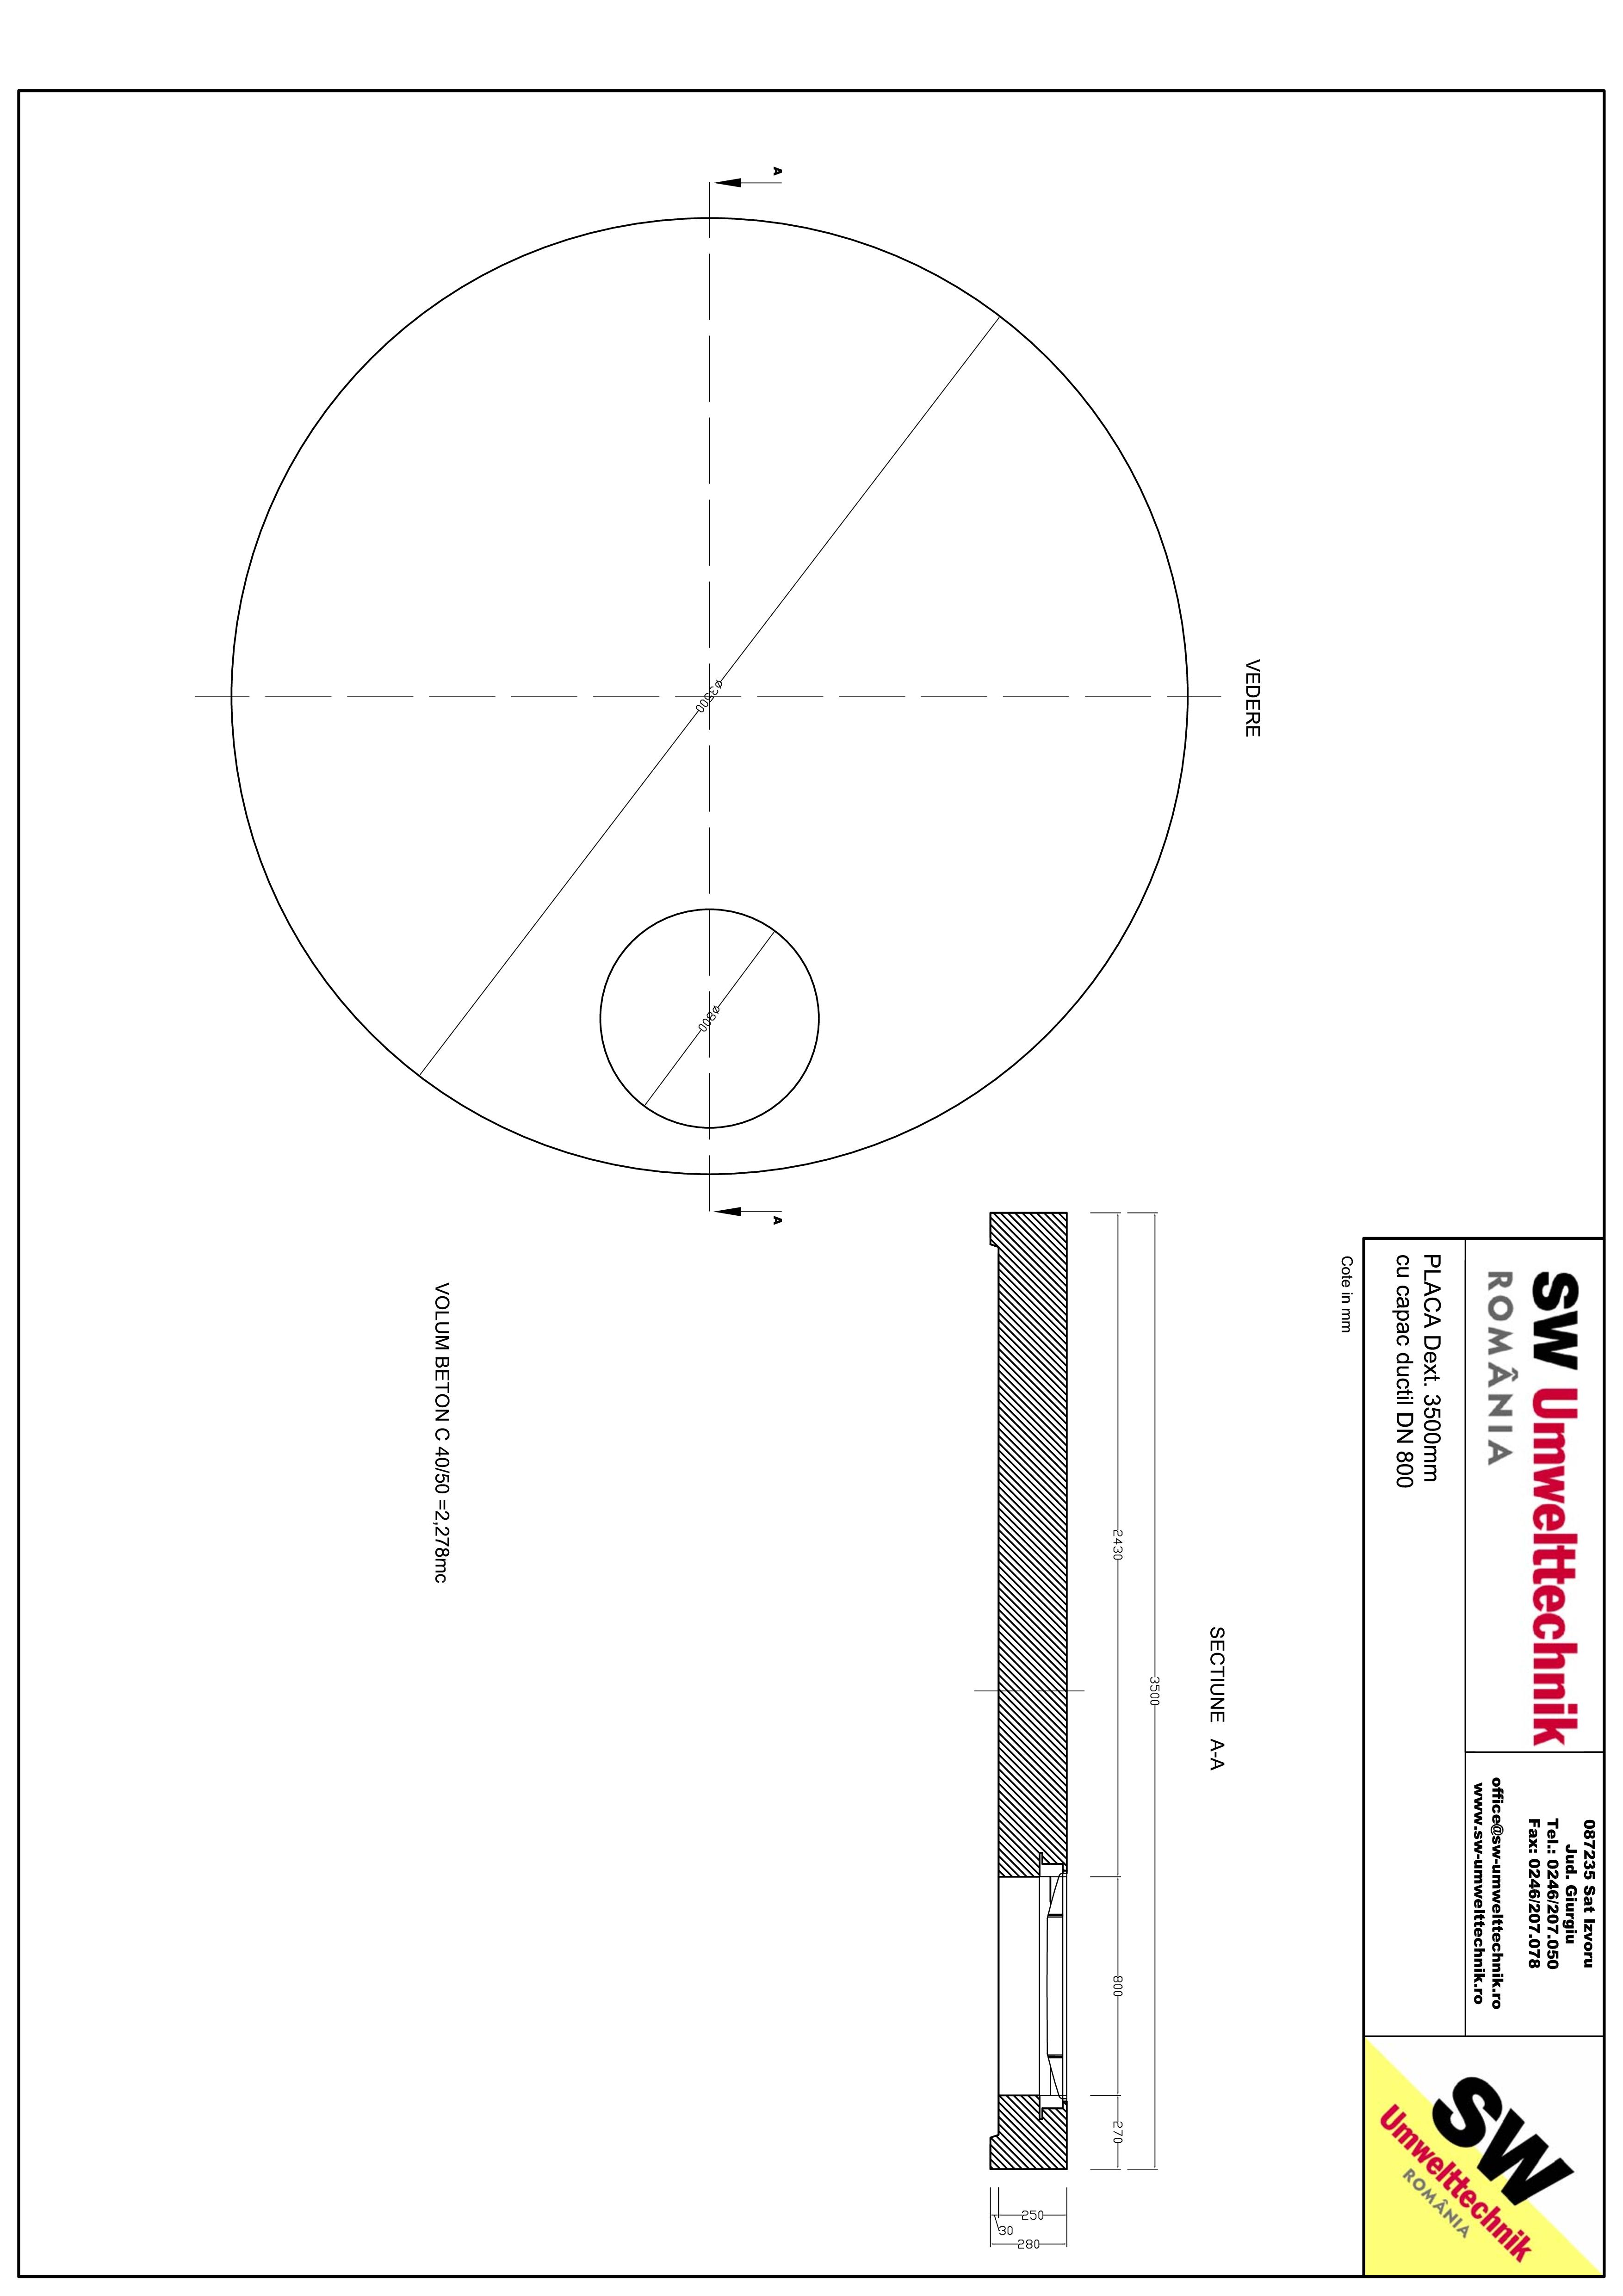 Pagina 1 - CAD-PDF Placa Dext. 3500 H250 cu capac ductil DN800 SW UMWELTTECHNIK Detaliu de produs